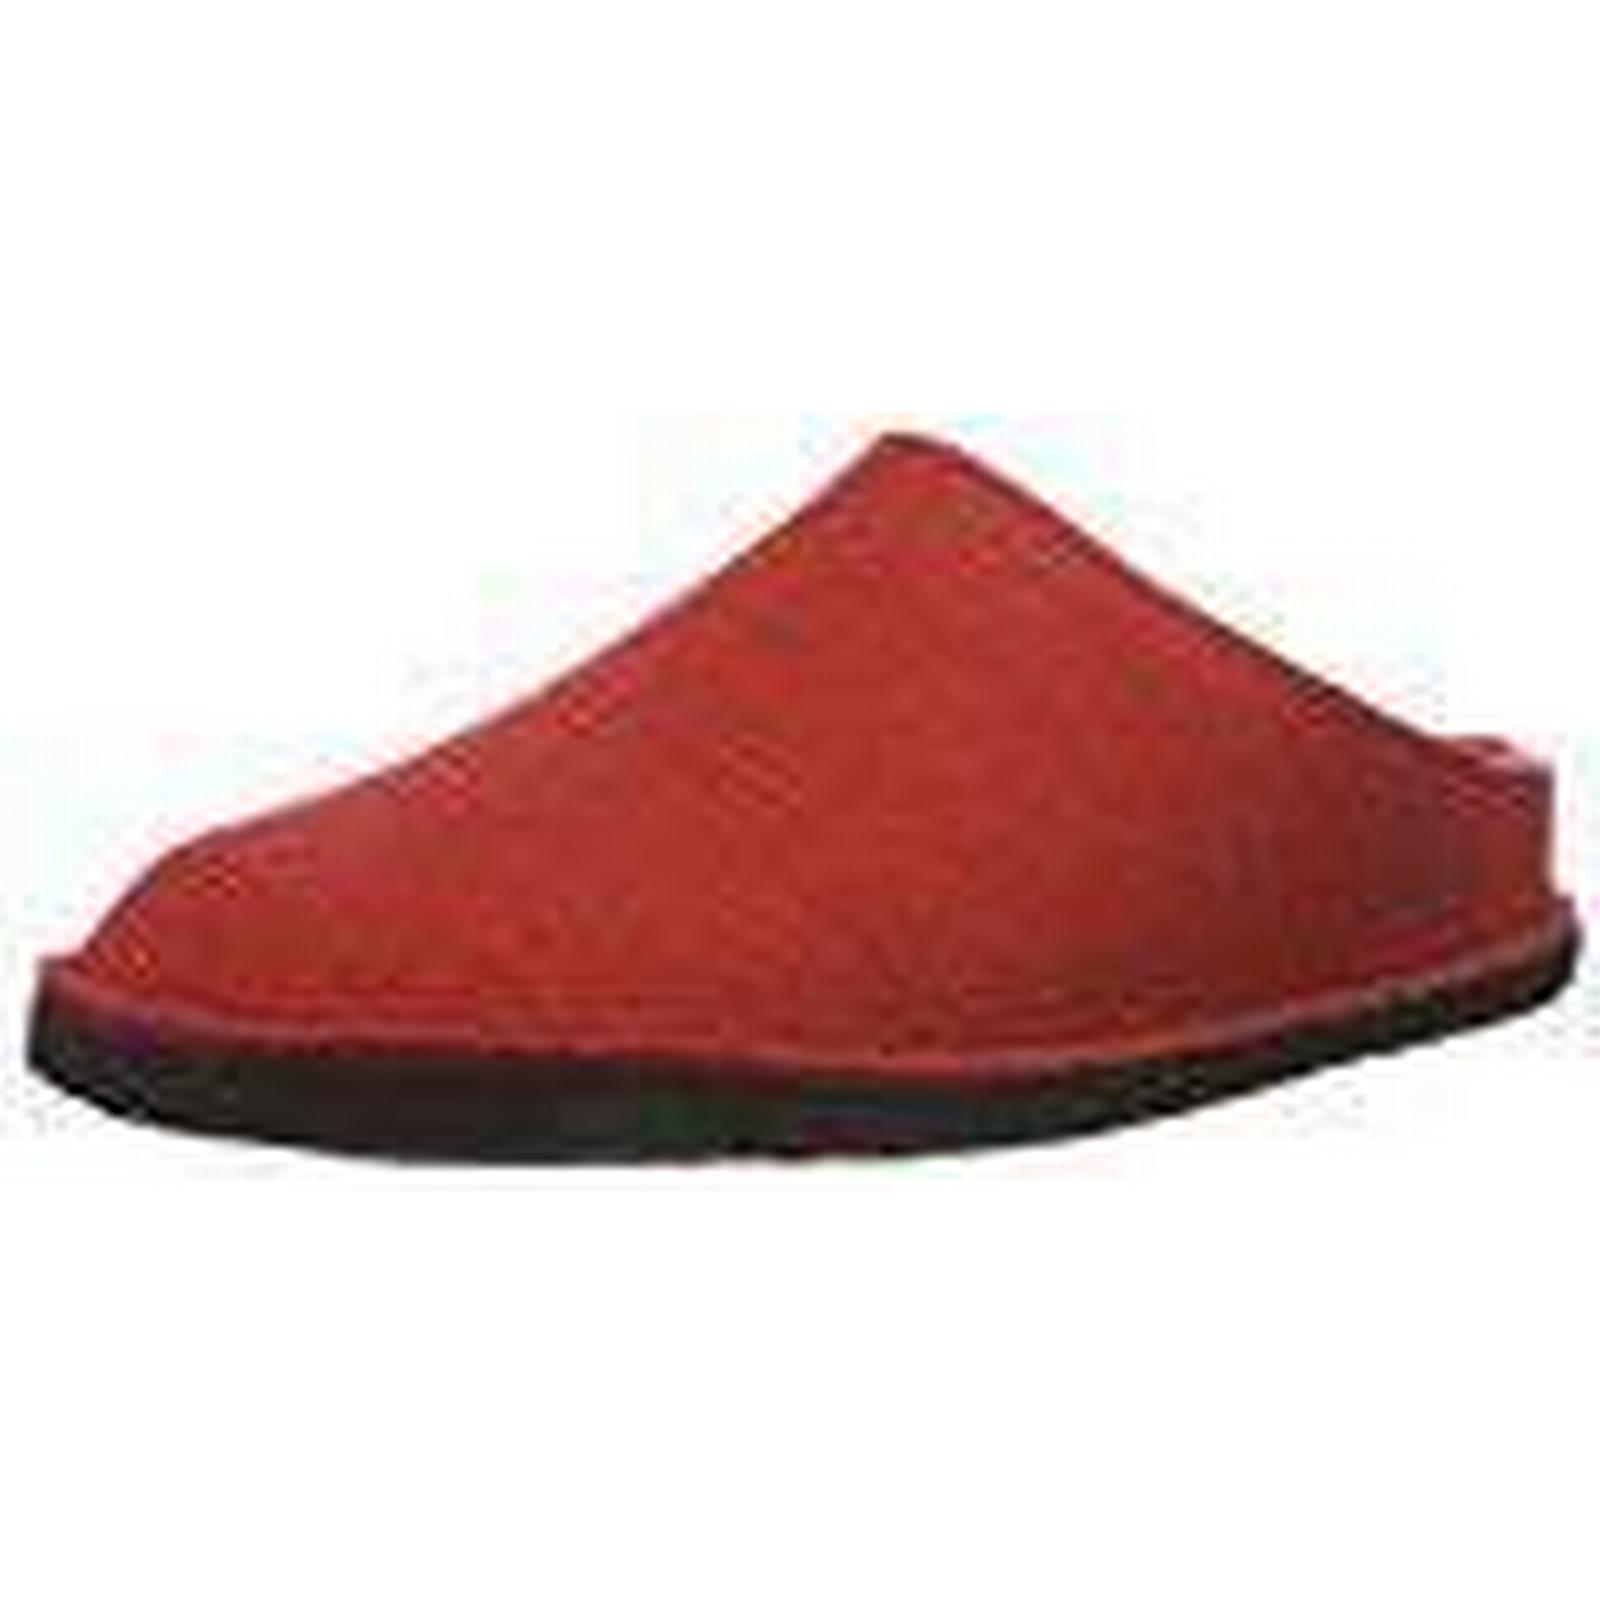 Haflinger Soft, Women's Low-Top, Red (37 (11 Rubin), 4 UK (37 Red EU) 713c05